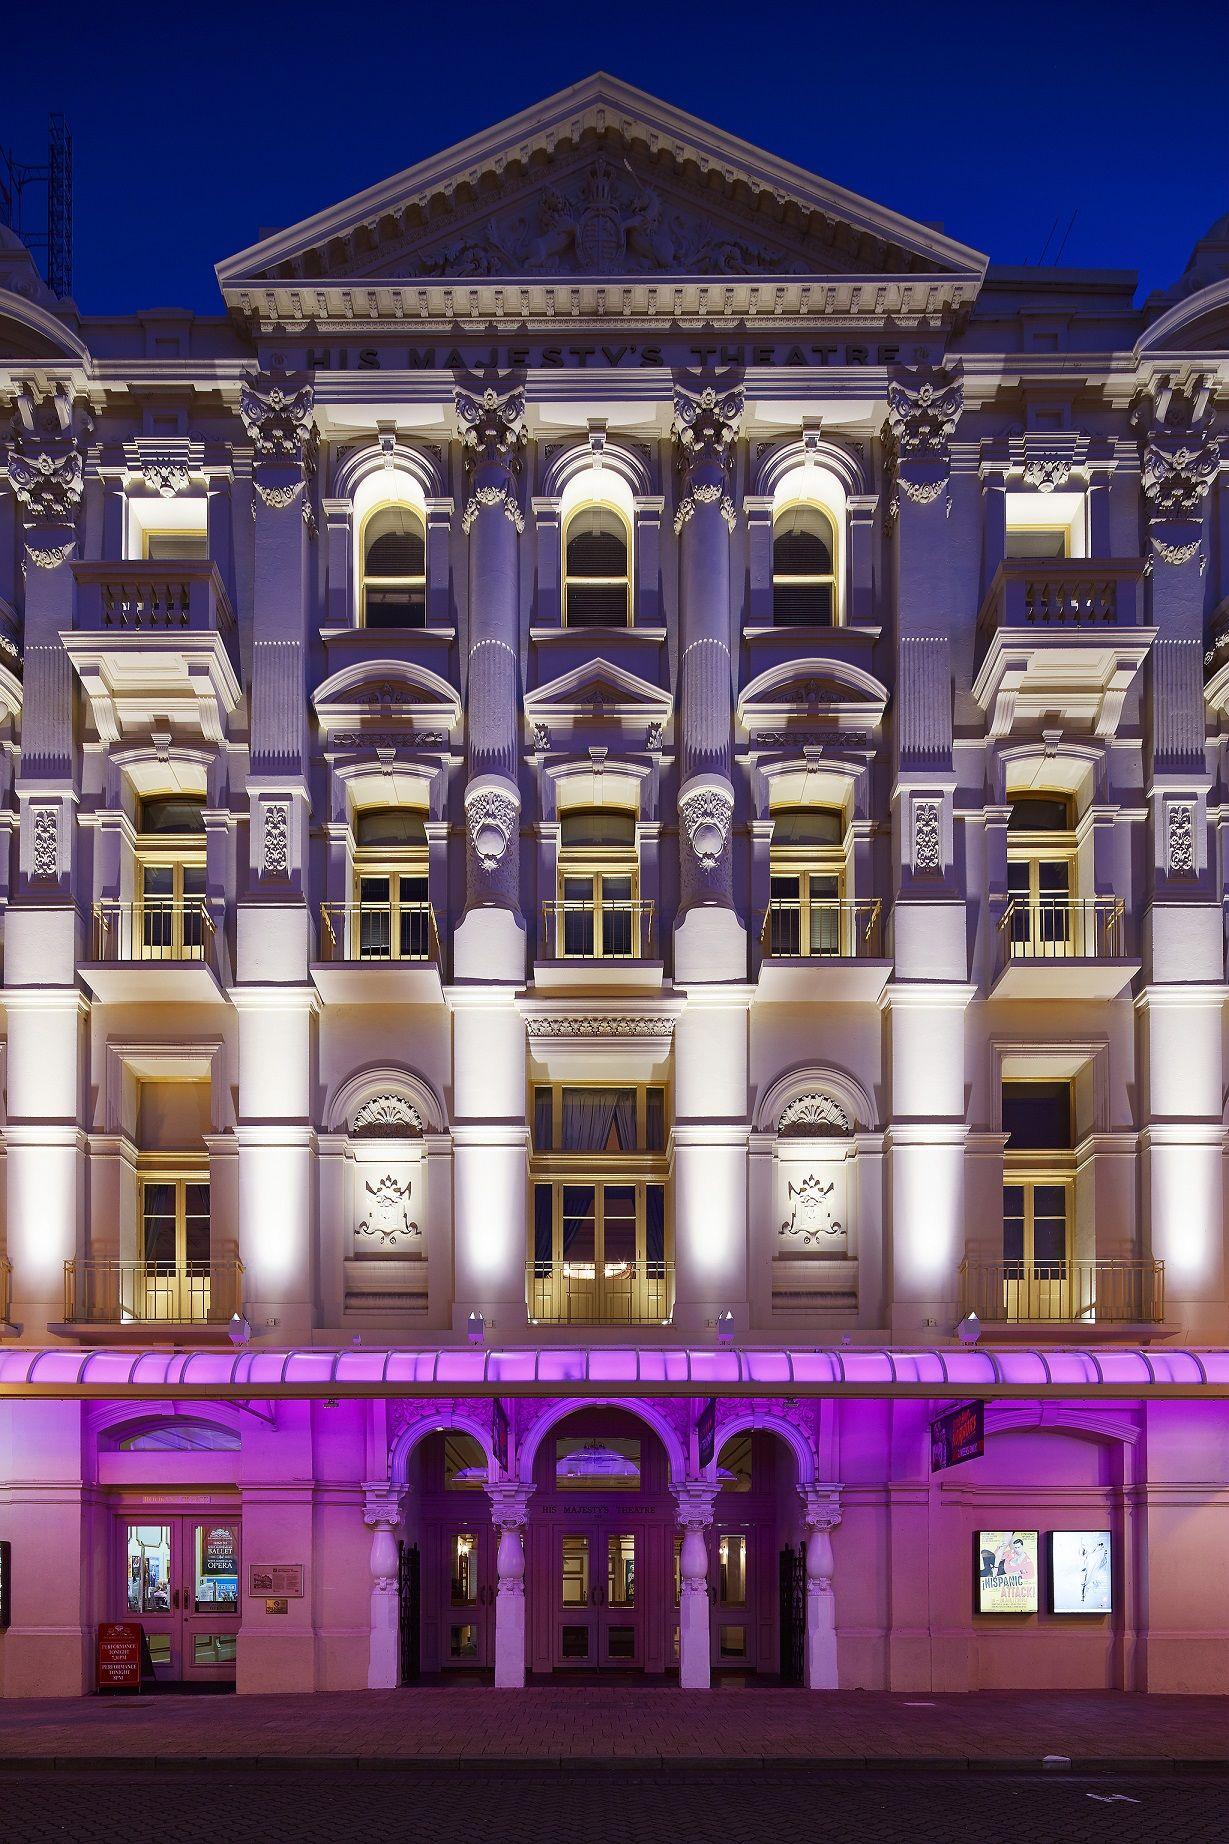 His majestys theatre perth west australia opera lighting his majestys theatre perth west australia opera lighting project martin klaasen aloadofball Gallery